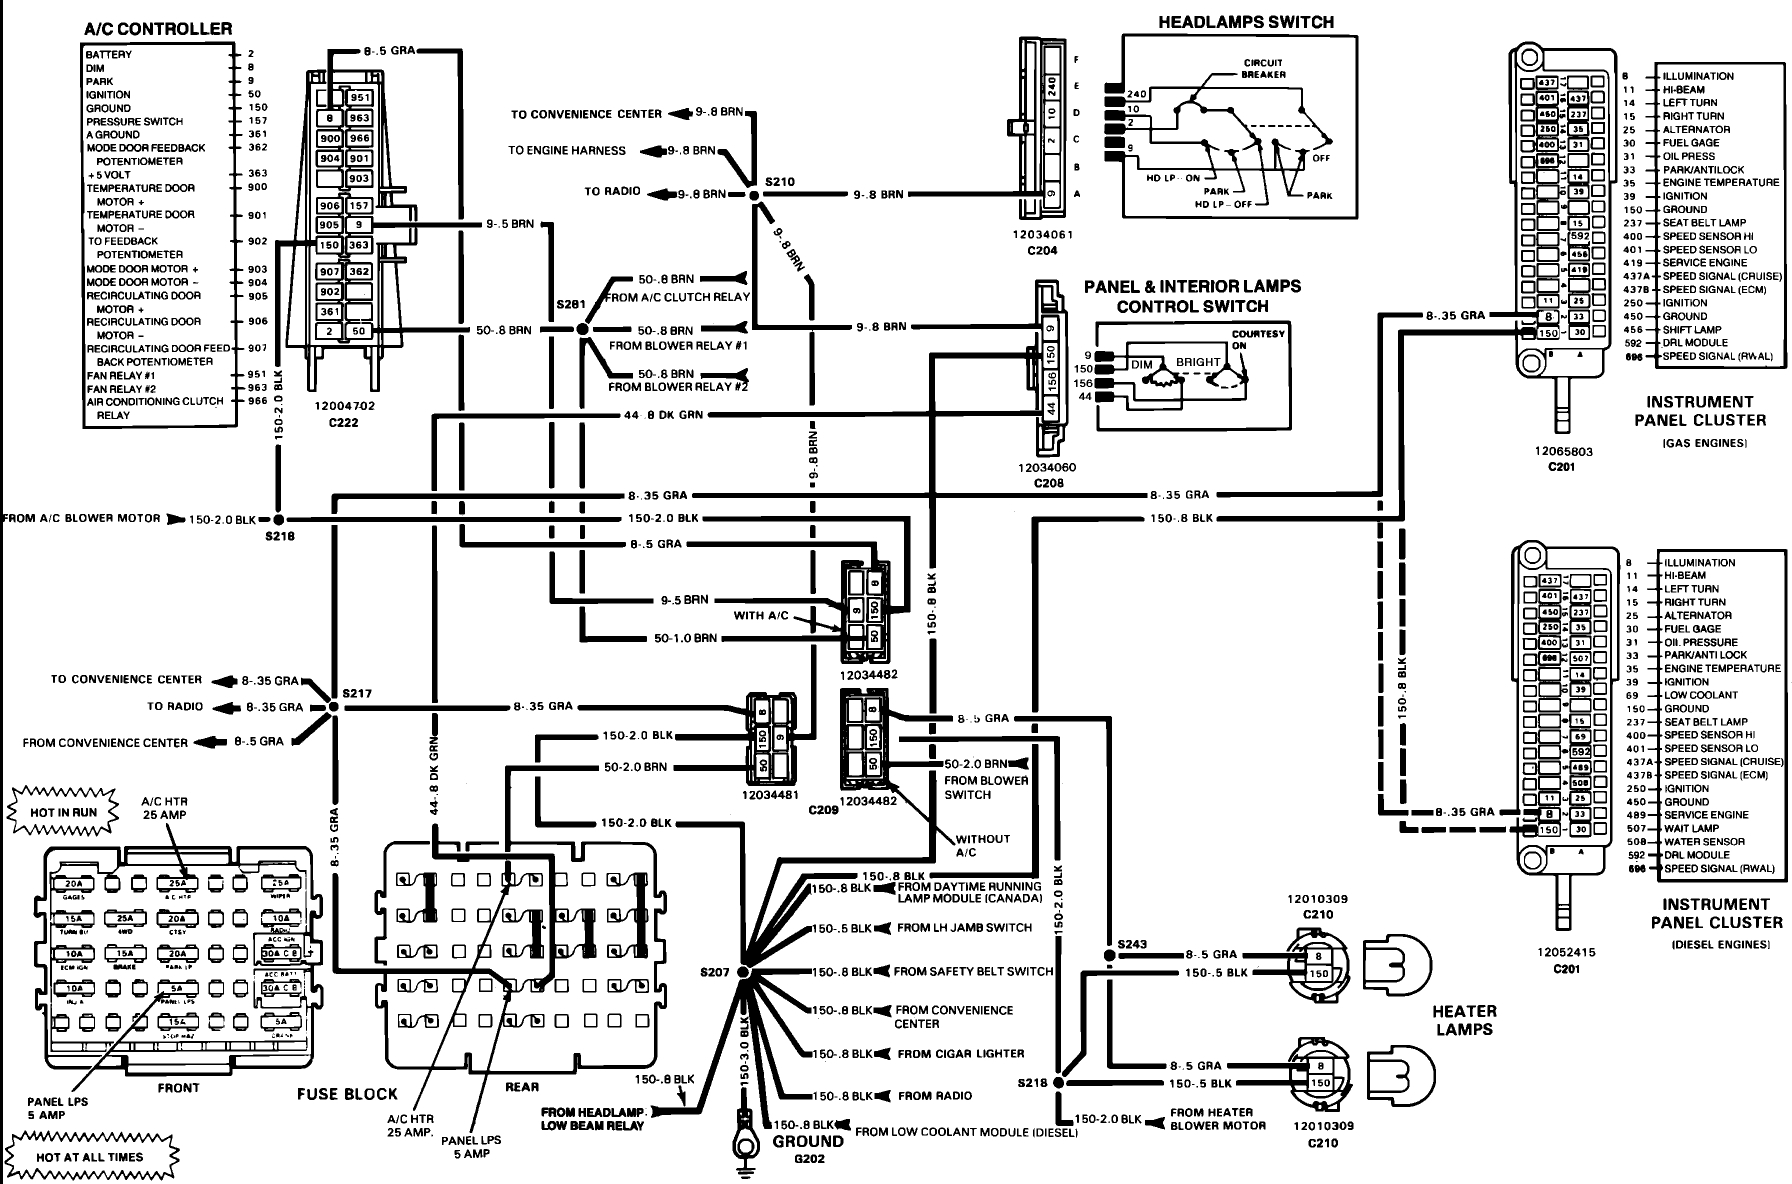 79 Chevy Wiring Diagram List HD Quality Wiring Diagram  homewiring.mindfulness-protocol.frmindfulness-protocol.fr